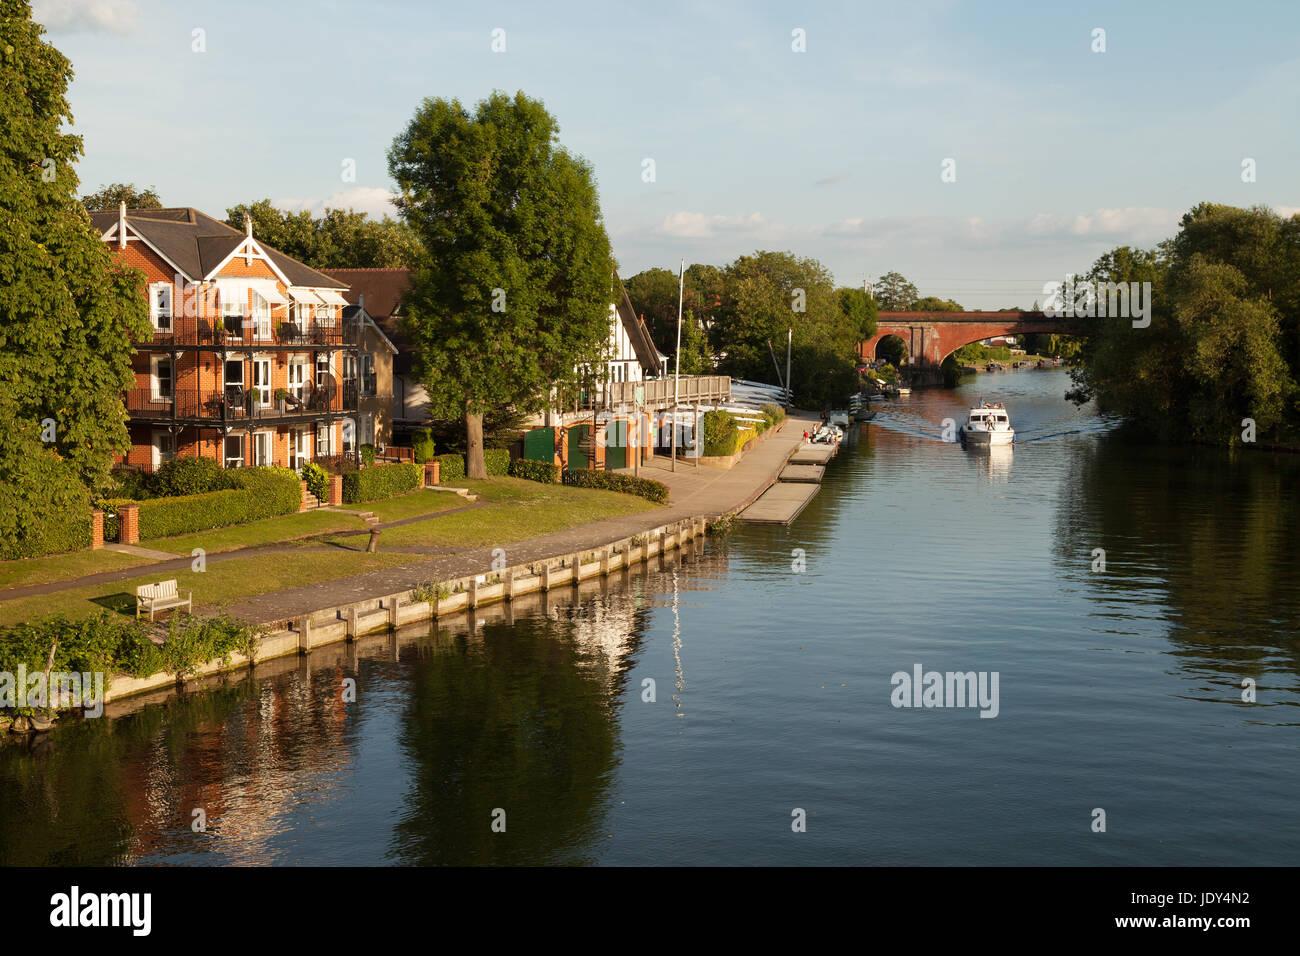 Thames River - el río Támesis en Taplow, Buckinghamshire Inglaterra Imagen De Stock